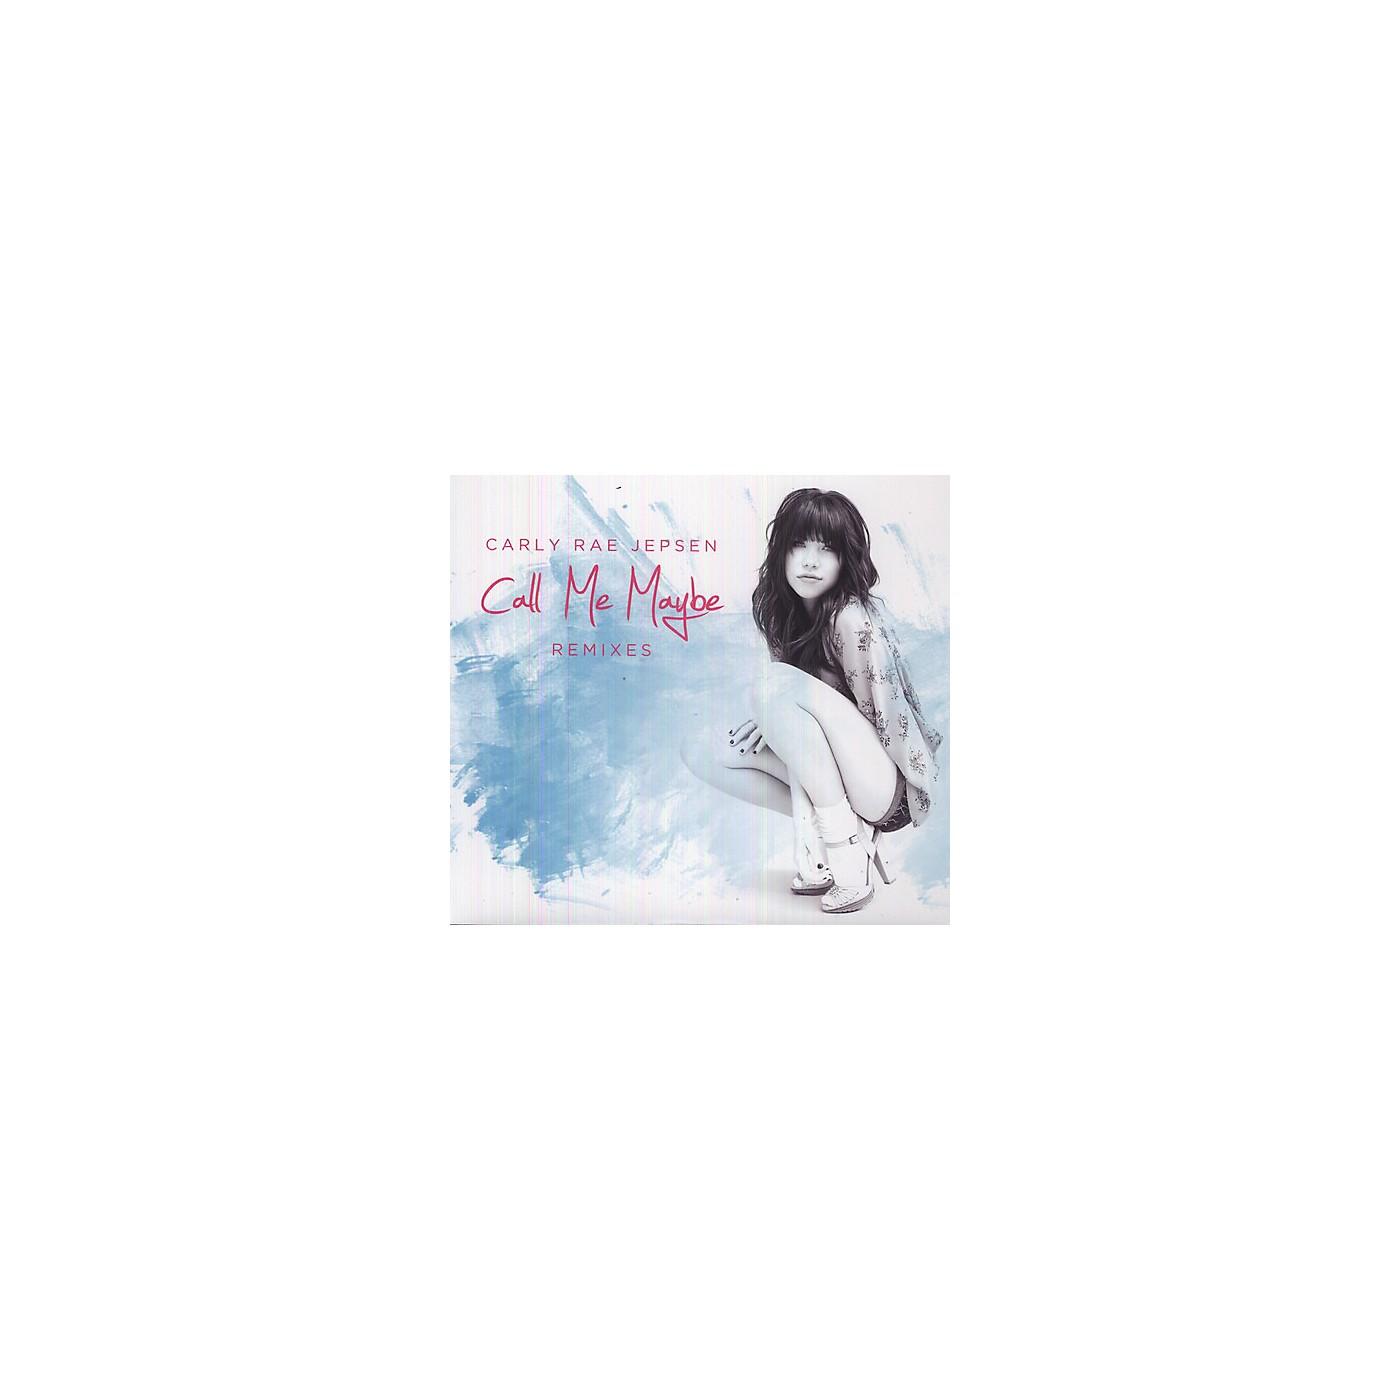 Alliance Carly Rae Jepsen - Call Me Maybe Remixes thumbnail